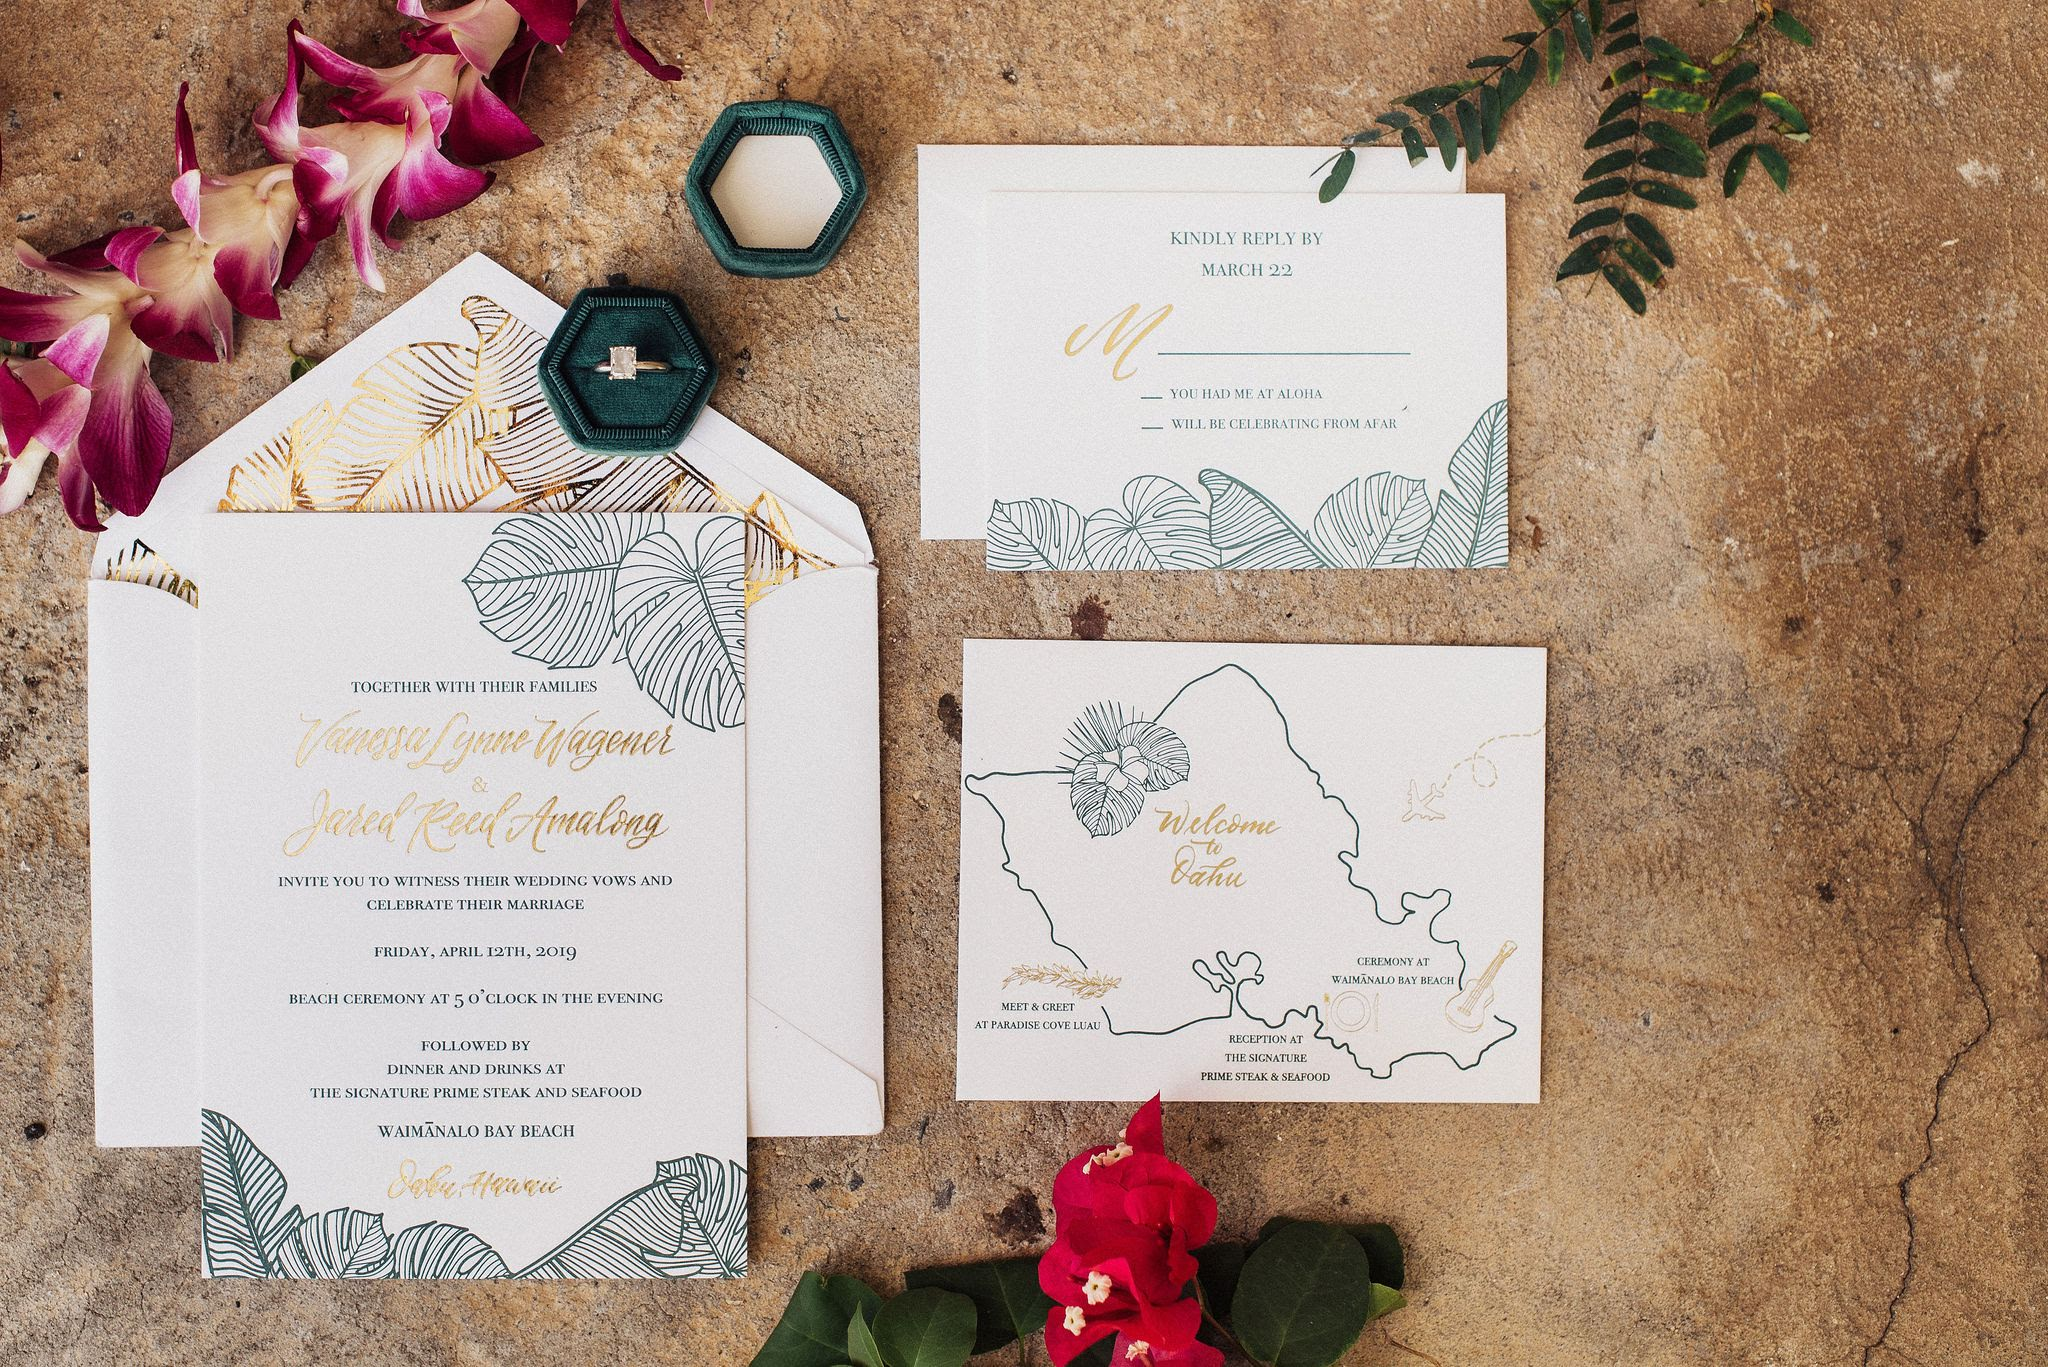 Letterpress and gold foil invitation